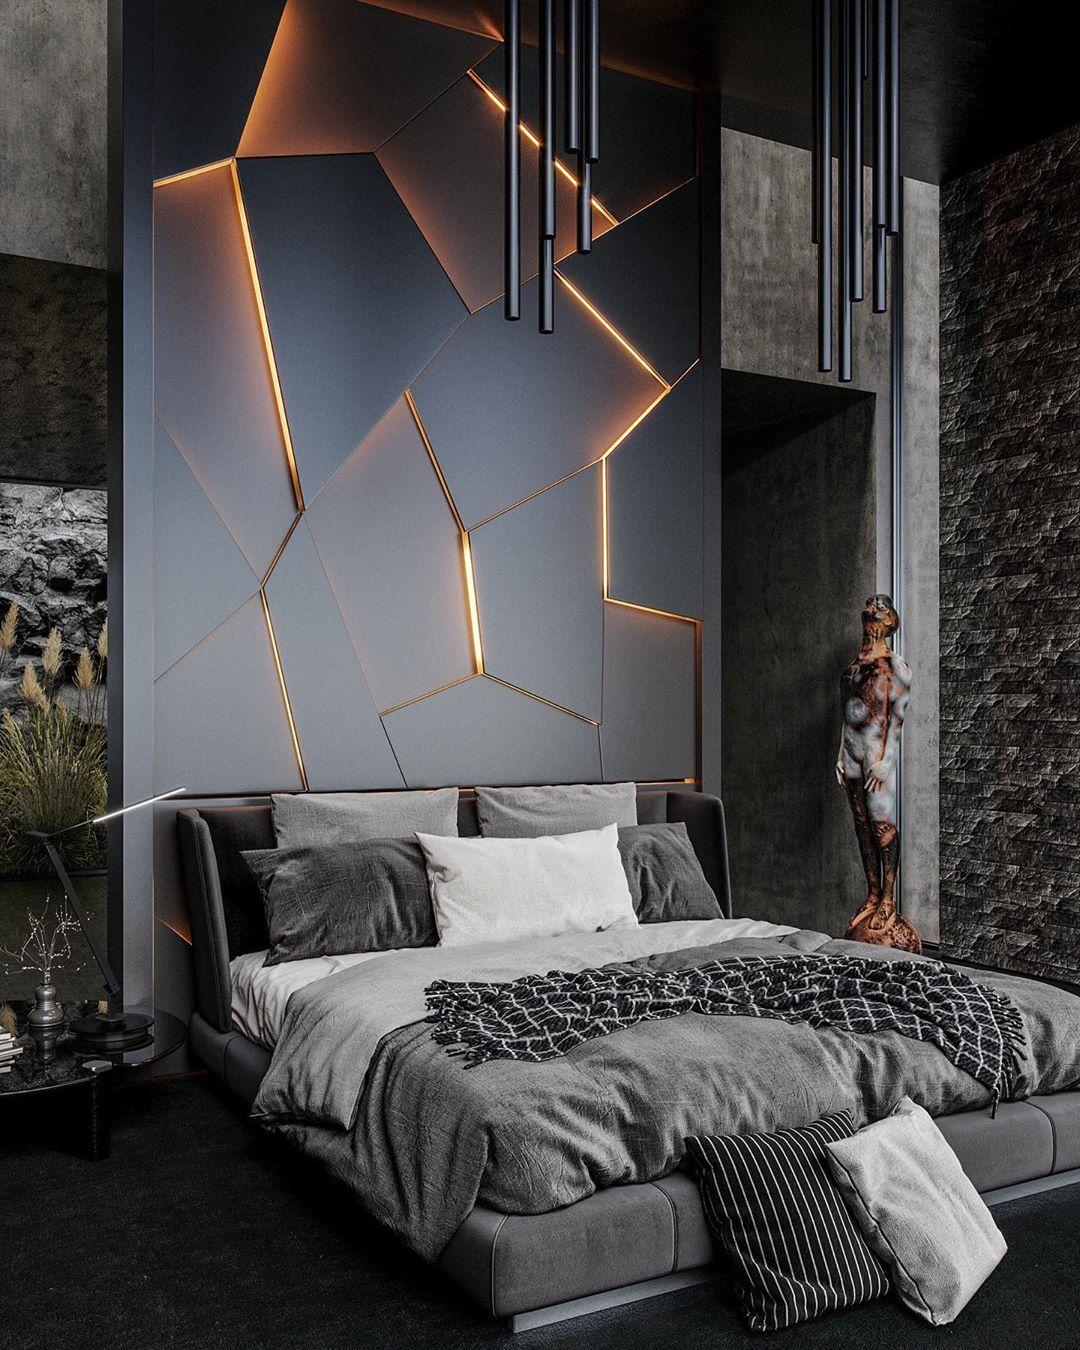 Case Moderne Interni Camere Da Letto.Lavaboy Bedroom And Bathroom Concept By 3dmstudio Image